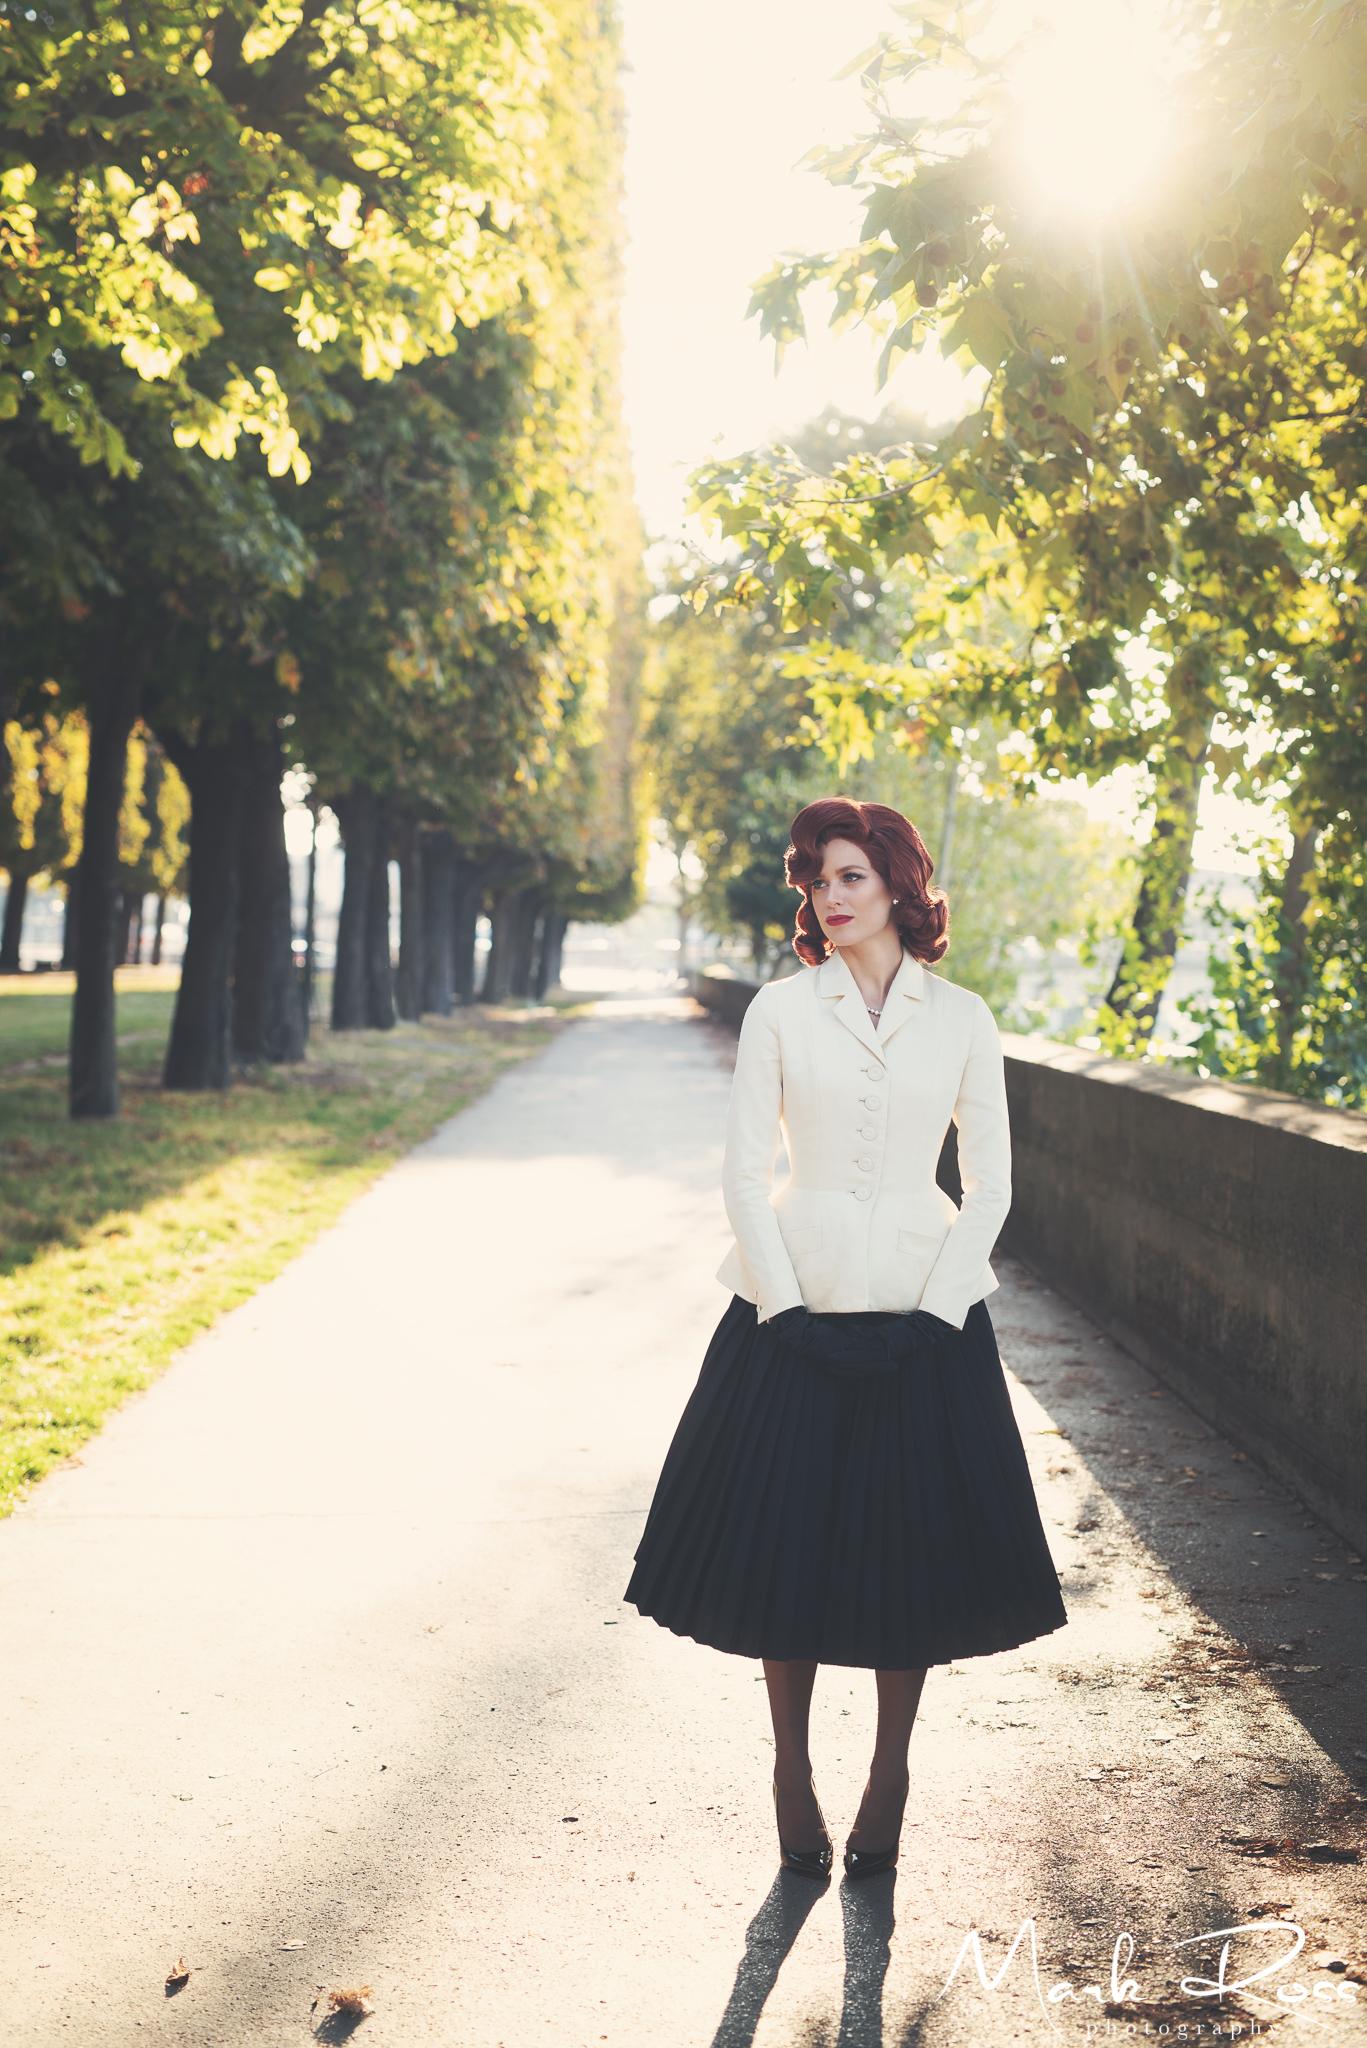 Denver-Portrait-Photographer-Mark-Ross-Photography-Maggie-Paris-2018-Dior-Bar-Suit-Web-Resolution-Watermarked-4.JPG